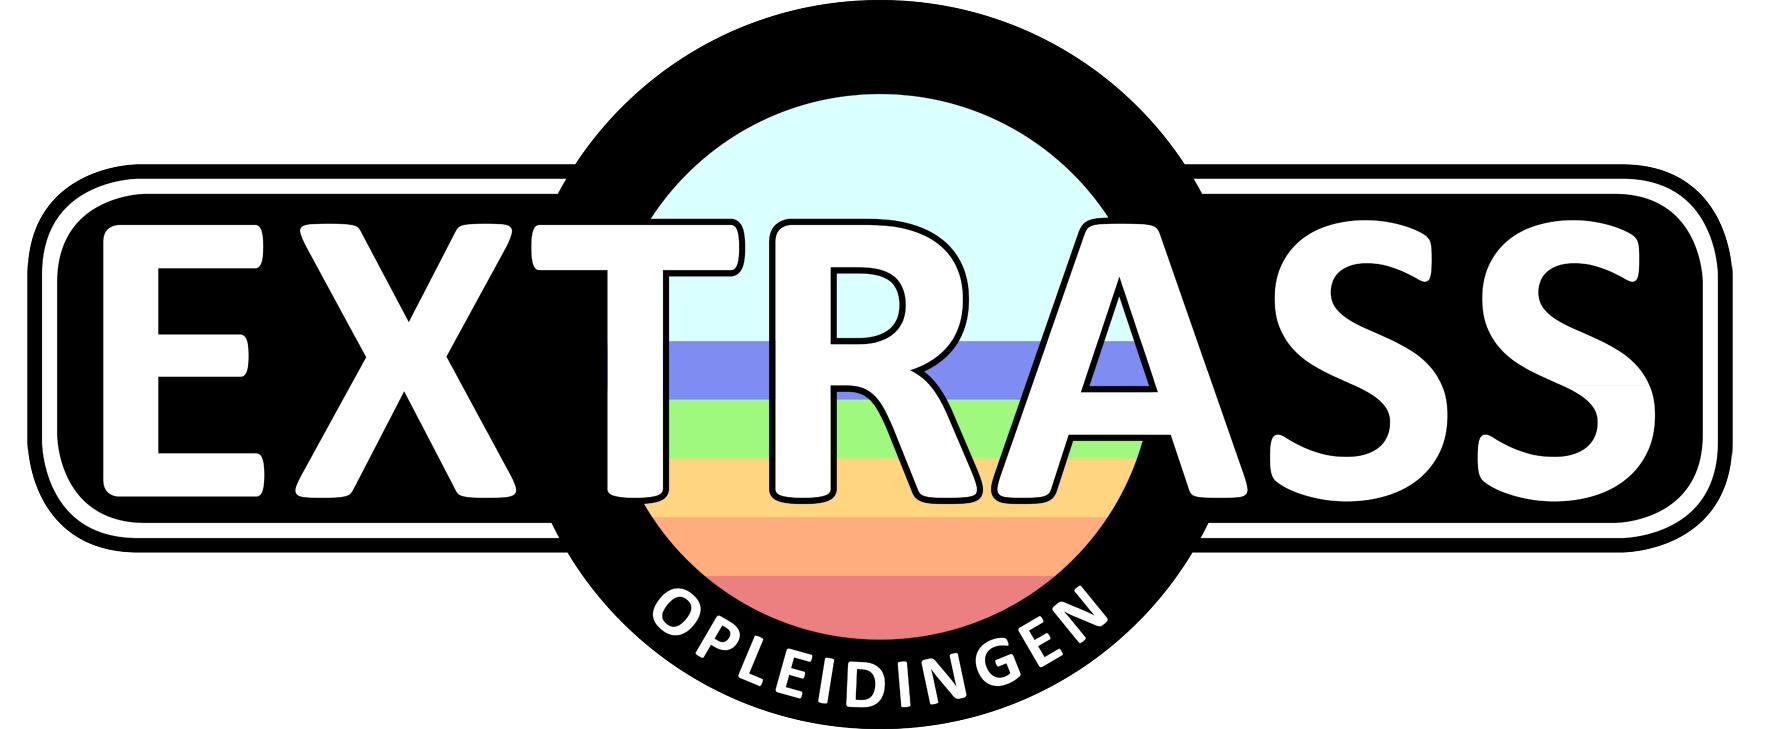 Logo Extrass 2.0